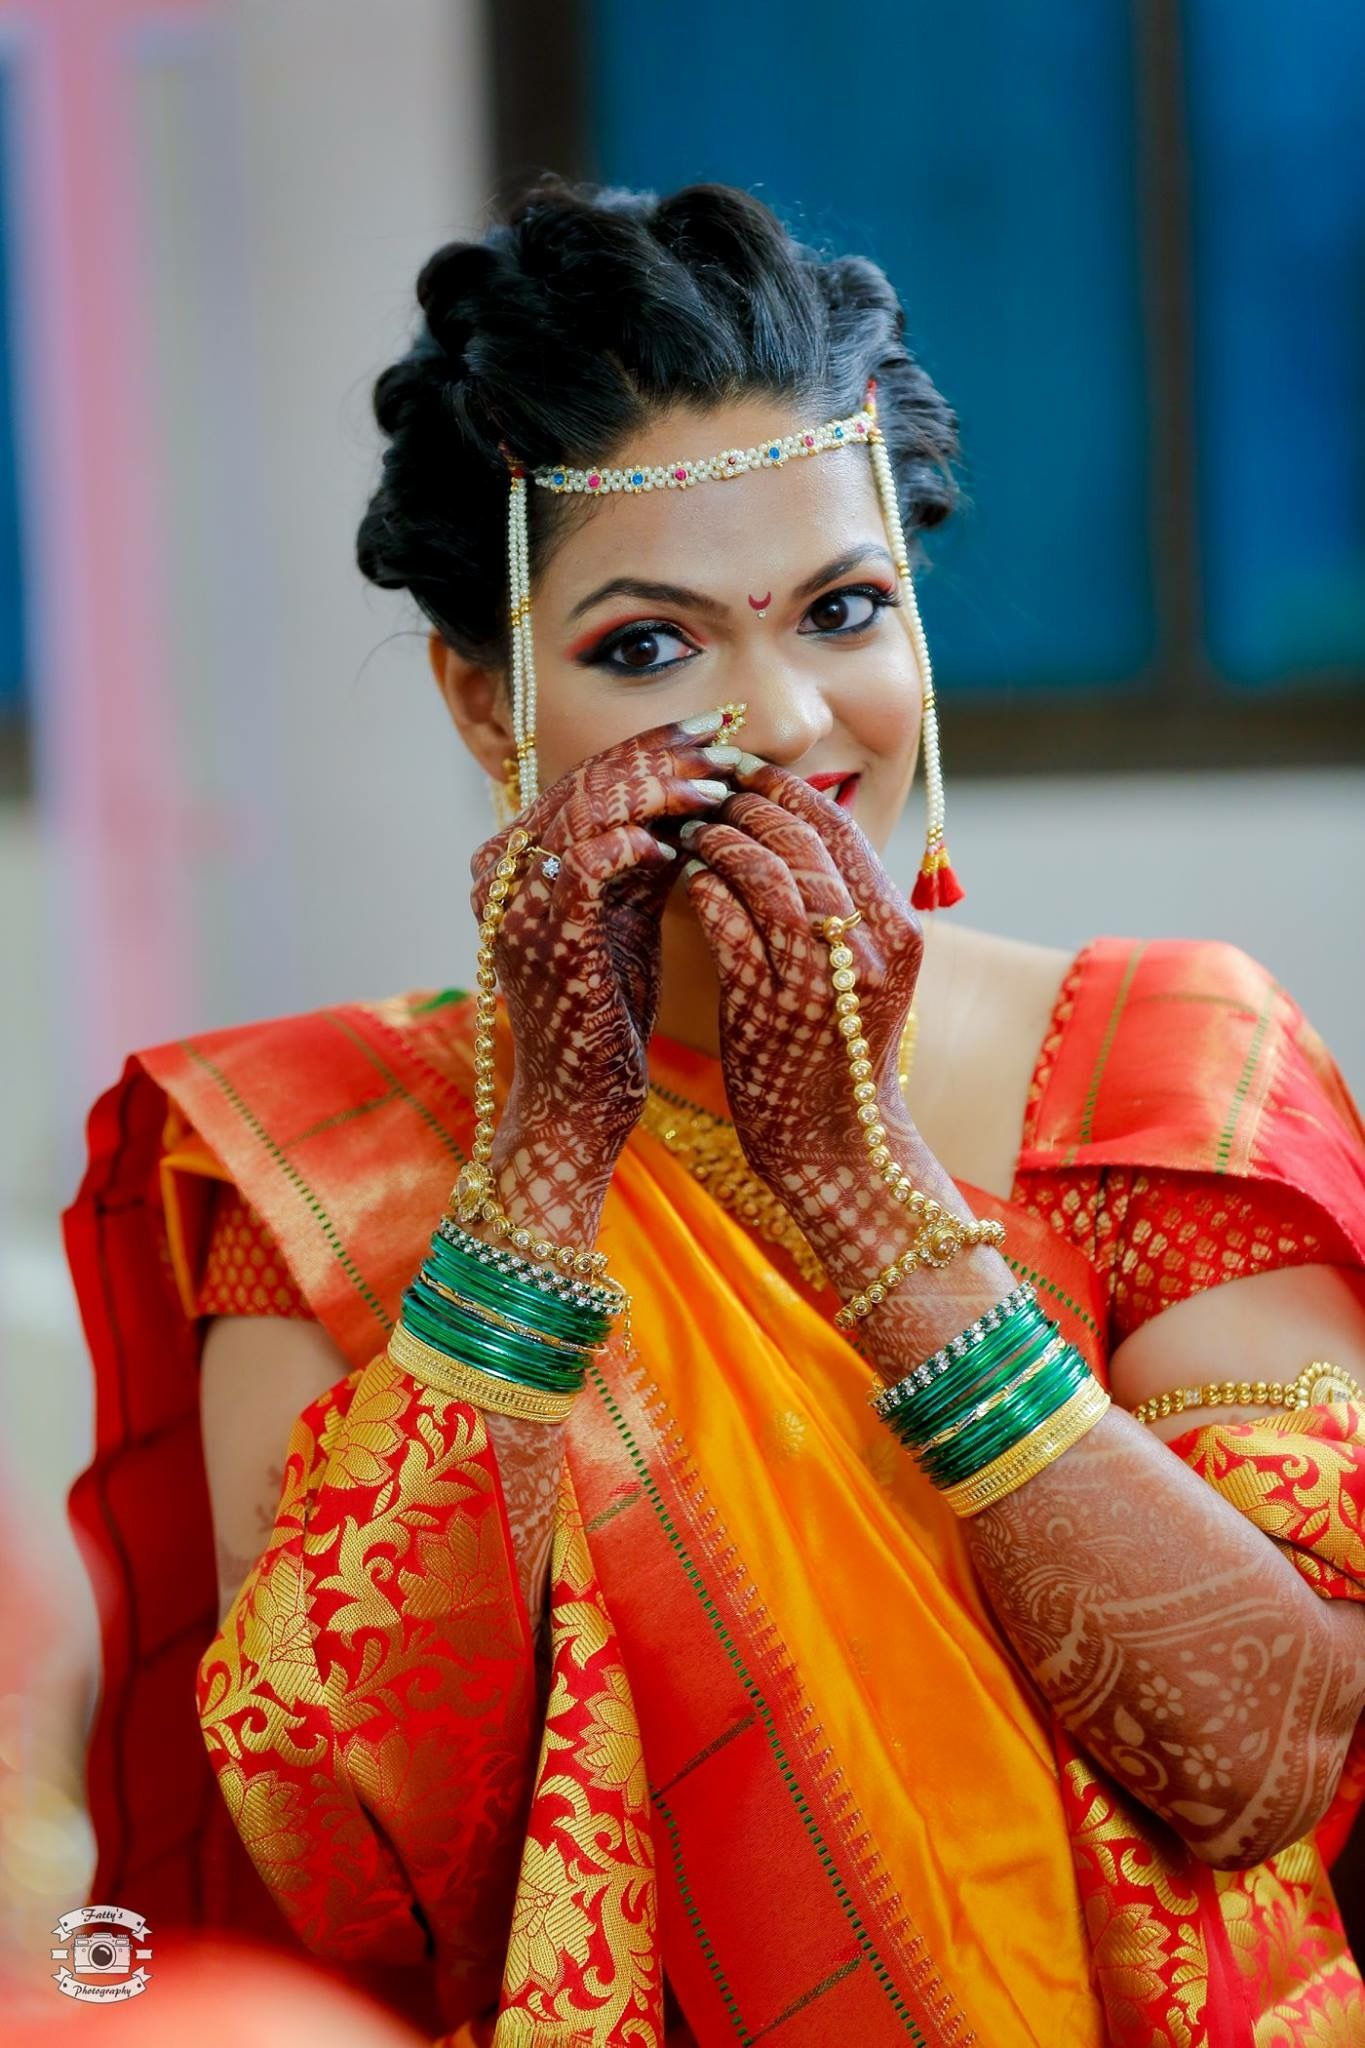 Maharashtrian Bride #maharashtrianbride | Indian bride hairstyle, Indian bridal hairstyles ...